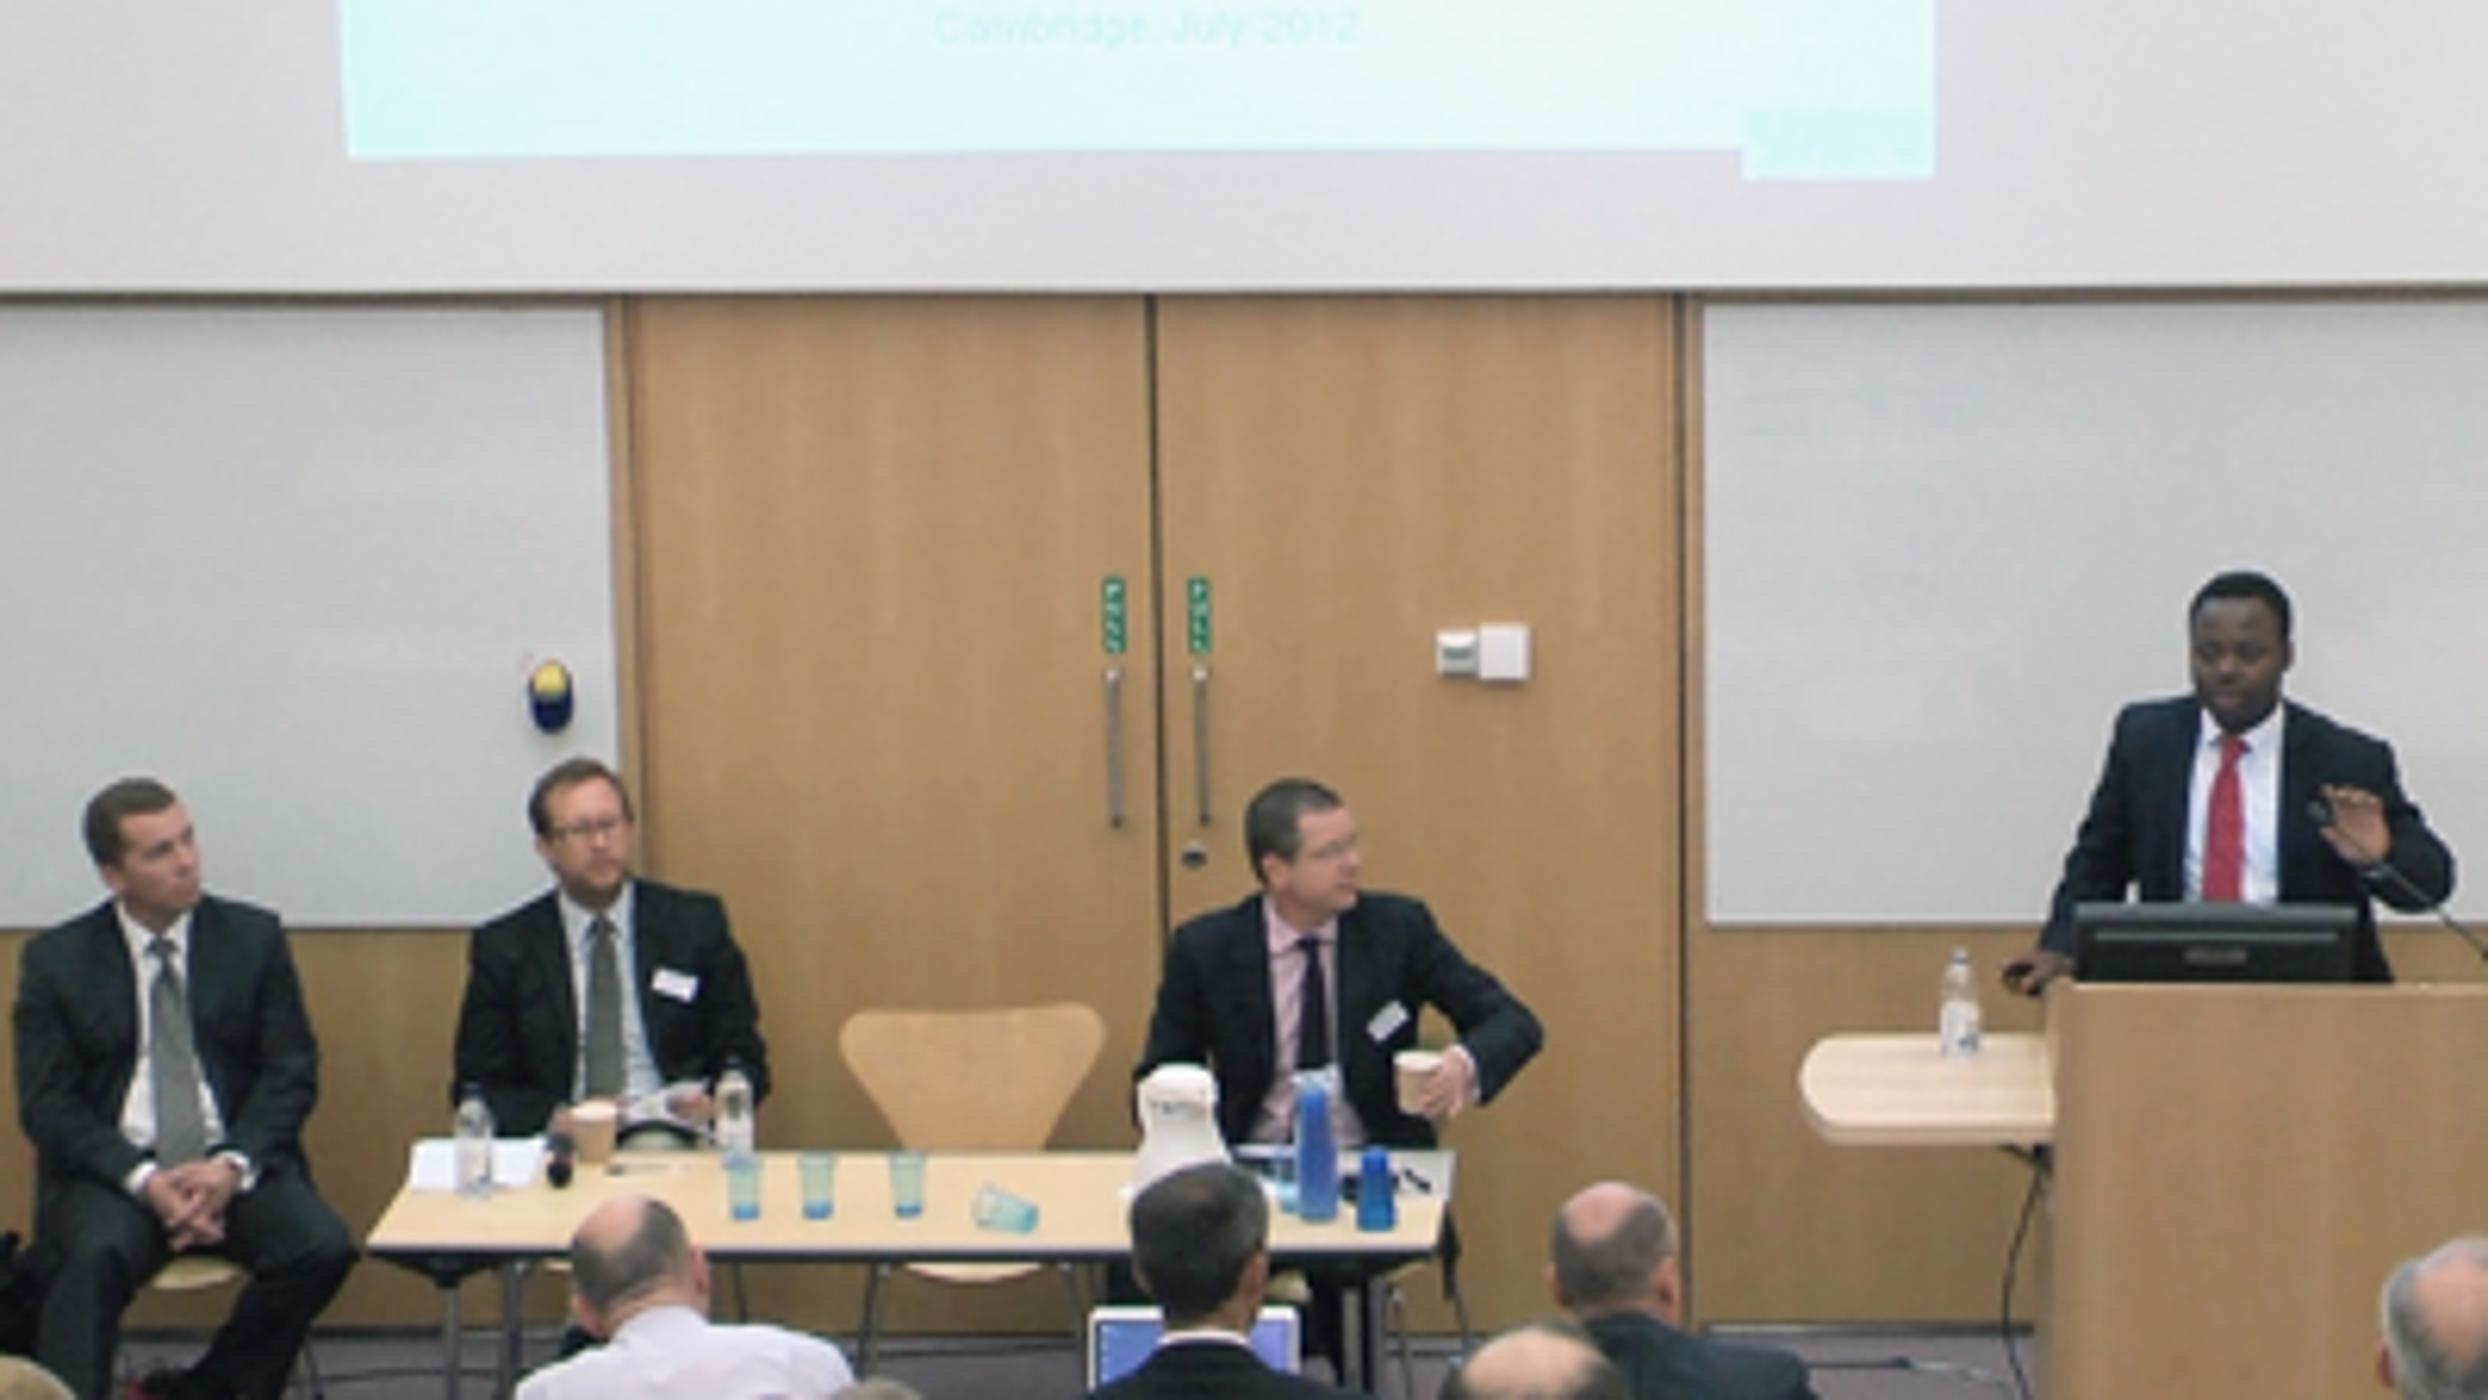 Day 3: 'Diagnostics in Evidence-Based Policing': Justice Tankebe, Paul Quinton, William McWilliam & Robert Carden (Audio)